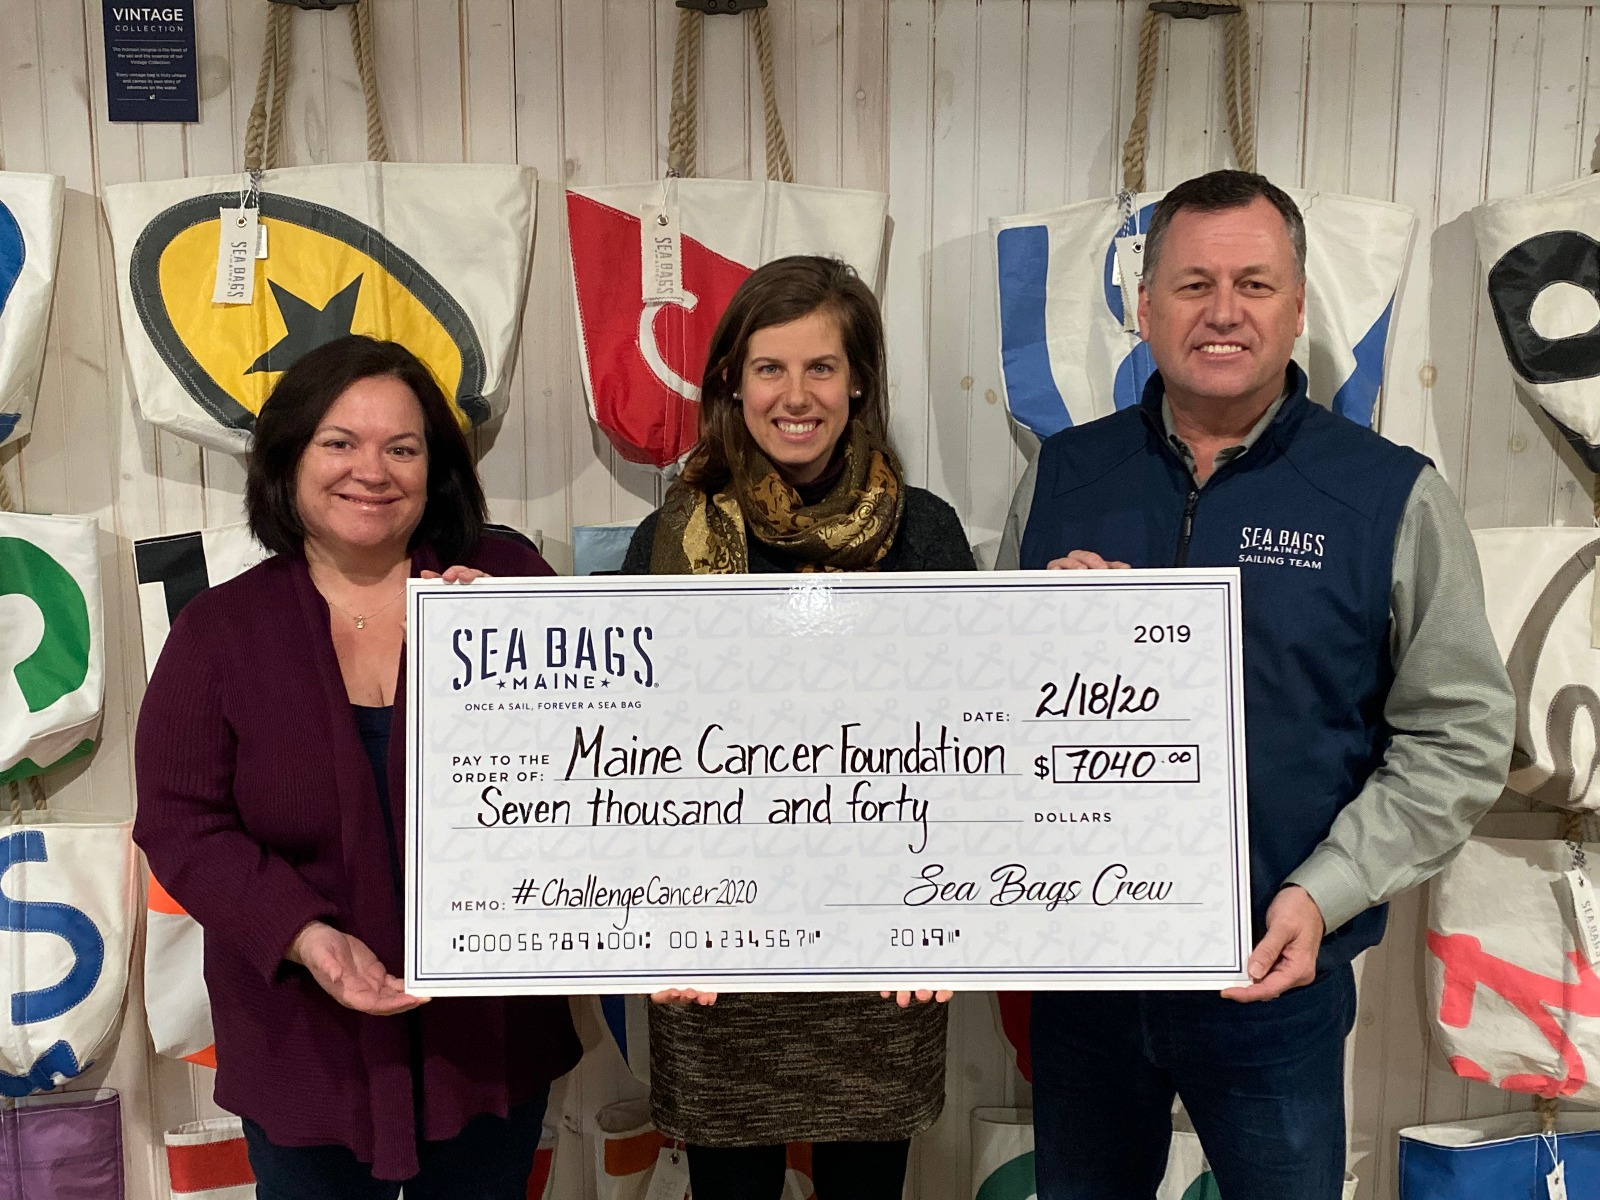 Sea Bags check presentation to Maine Cancer Foundation